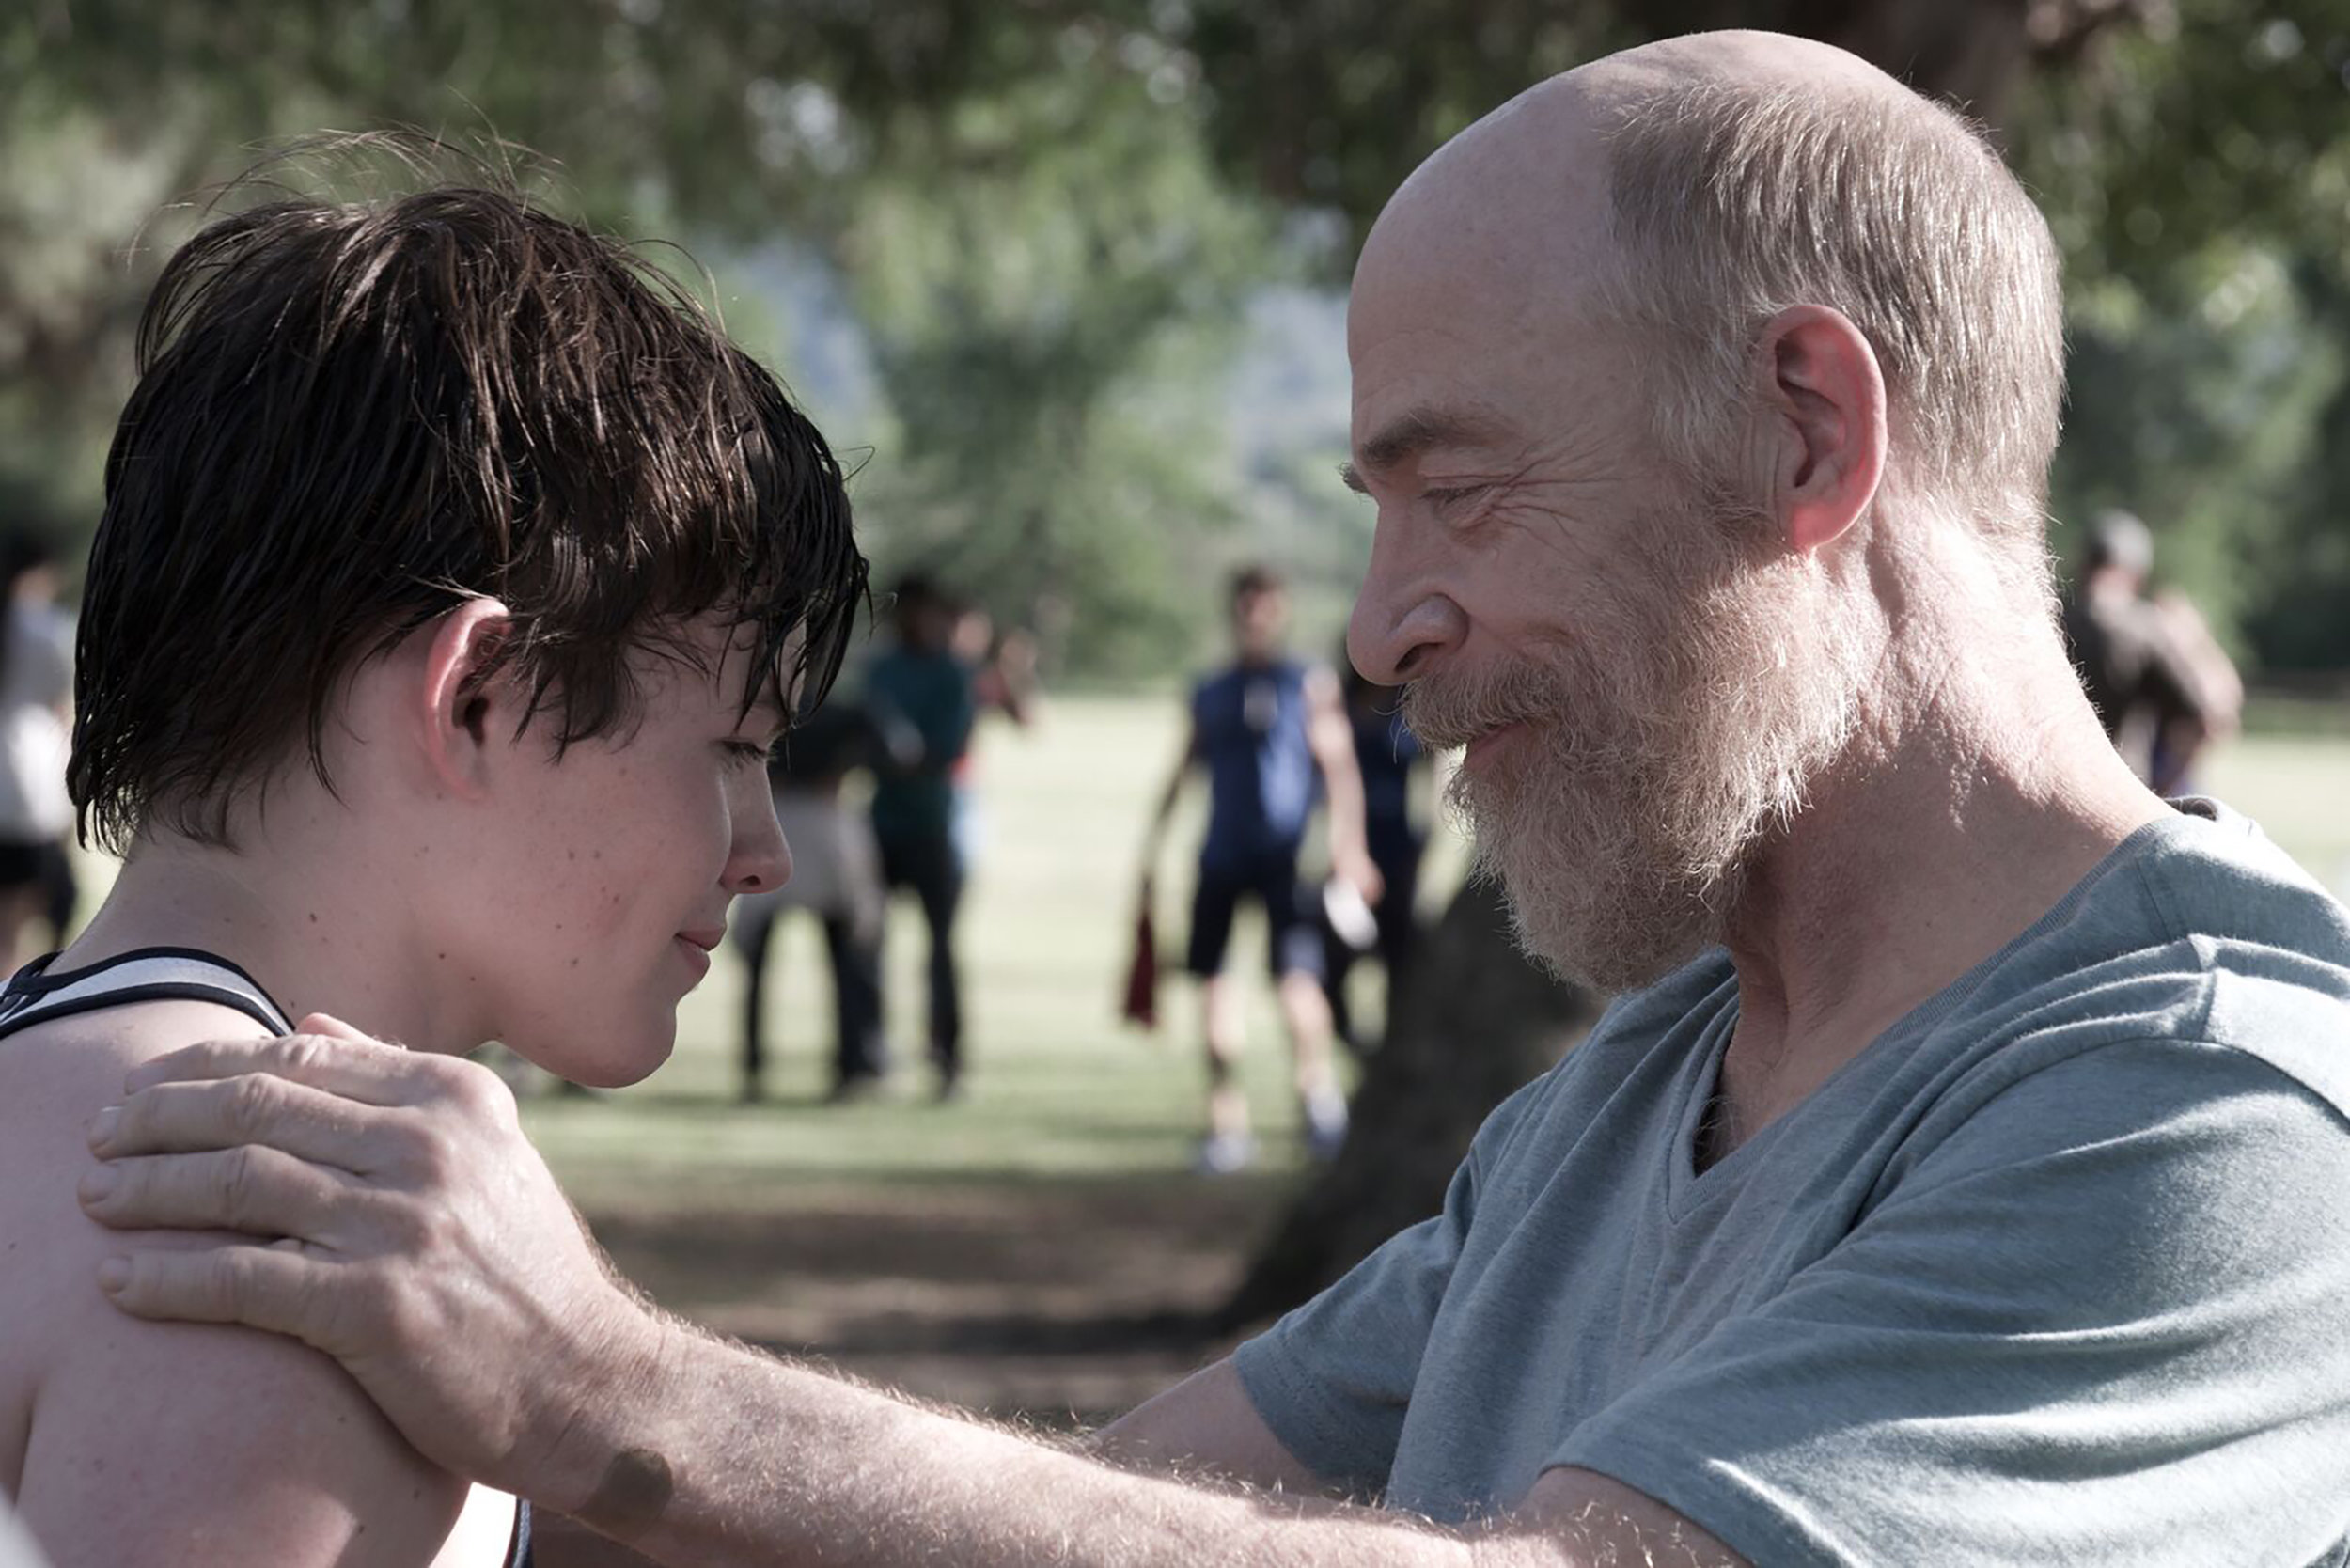 JK Simmons and Josh Wiggins, in The Bachelors, directed Kurt Voelker